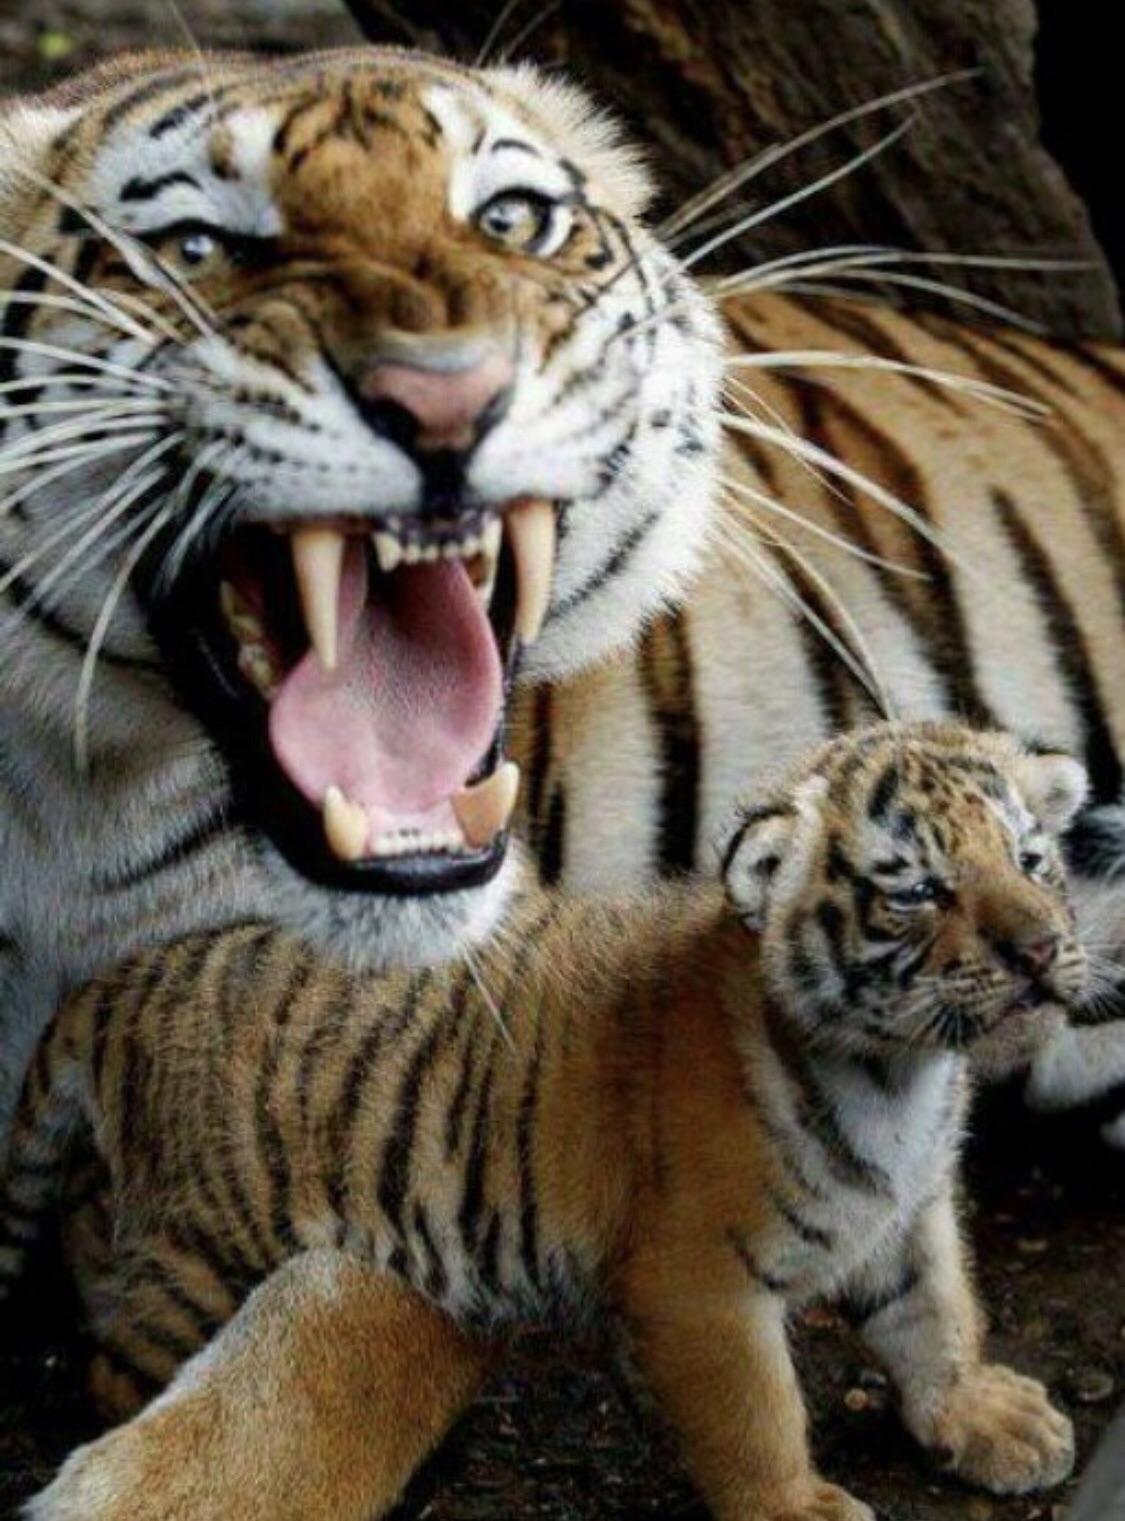 protective tiger mum hardcoreaww